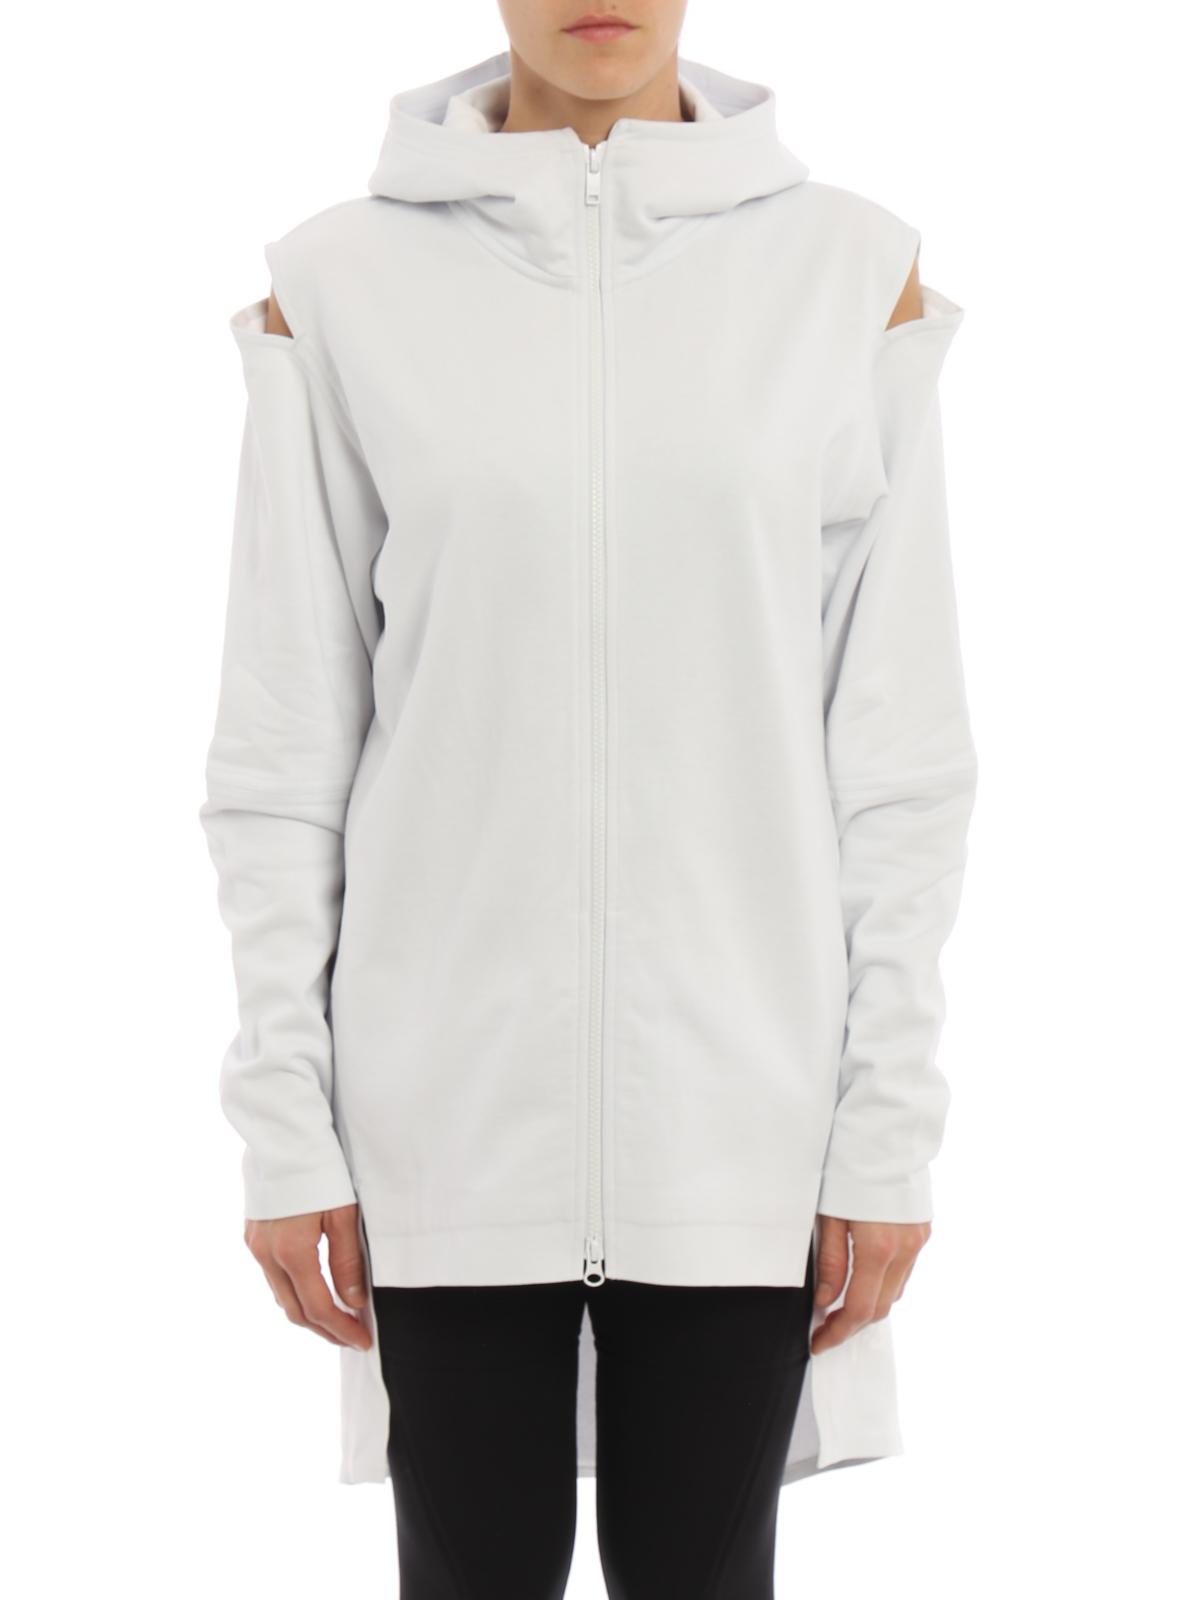 Cocoon 3 Sweaters Oversize Adidas Y Cotton Sweatshirtsamp; Hoodie UzVqpMS